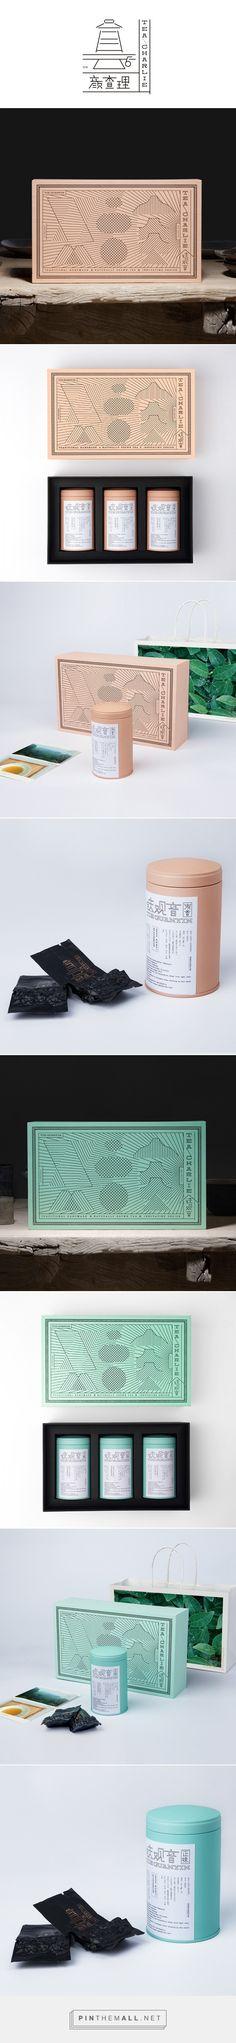 via iyeslogo curated by Packaging Diva PD. Tea Packaging, Food Packaging Design, Packaging Design Inspiration, Brand Packaging, Graphic Design Branding, Stationery Design, Corporate Design, Brochure Design, Tea Design